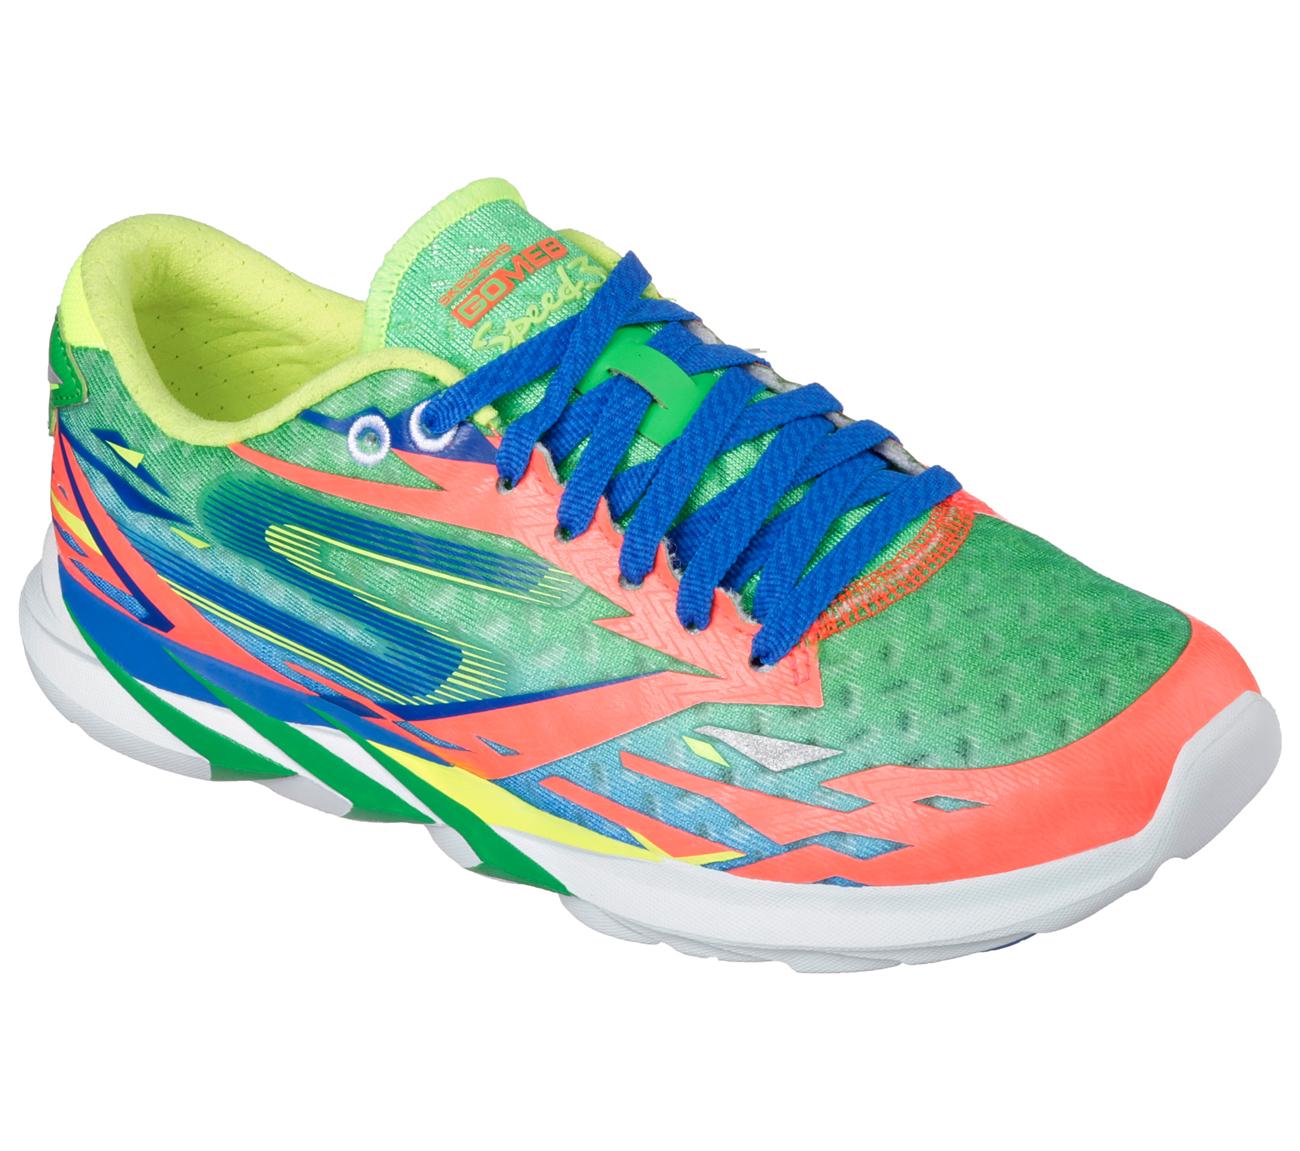 Skechers Synergy Pink Women Running Shoes - 11681-HPLM_View_4/fashion/sports/skechers